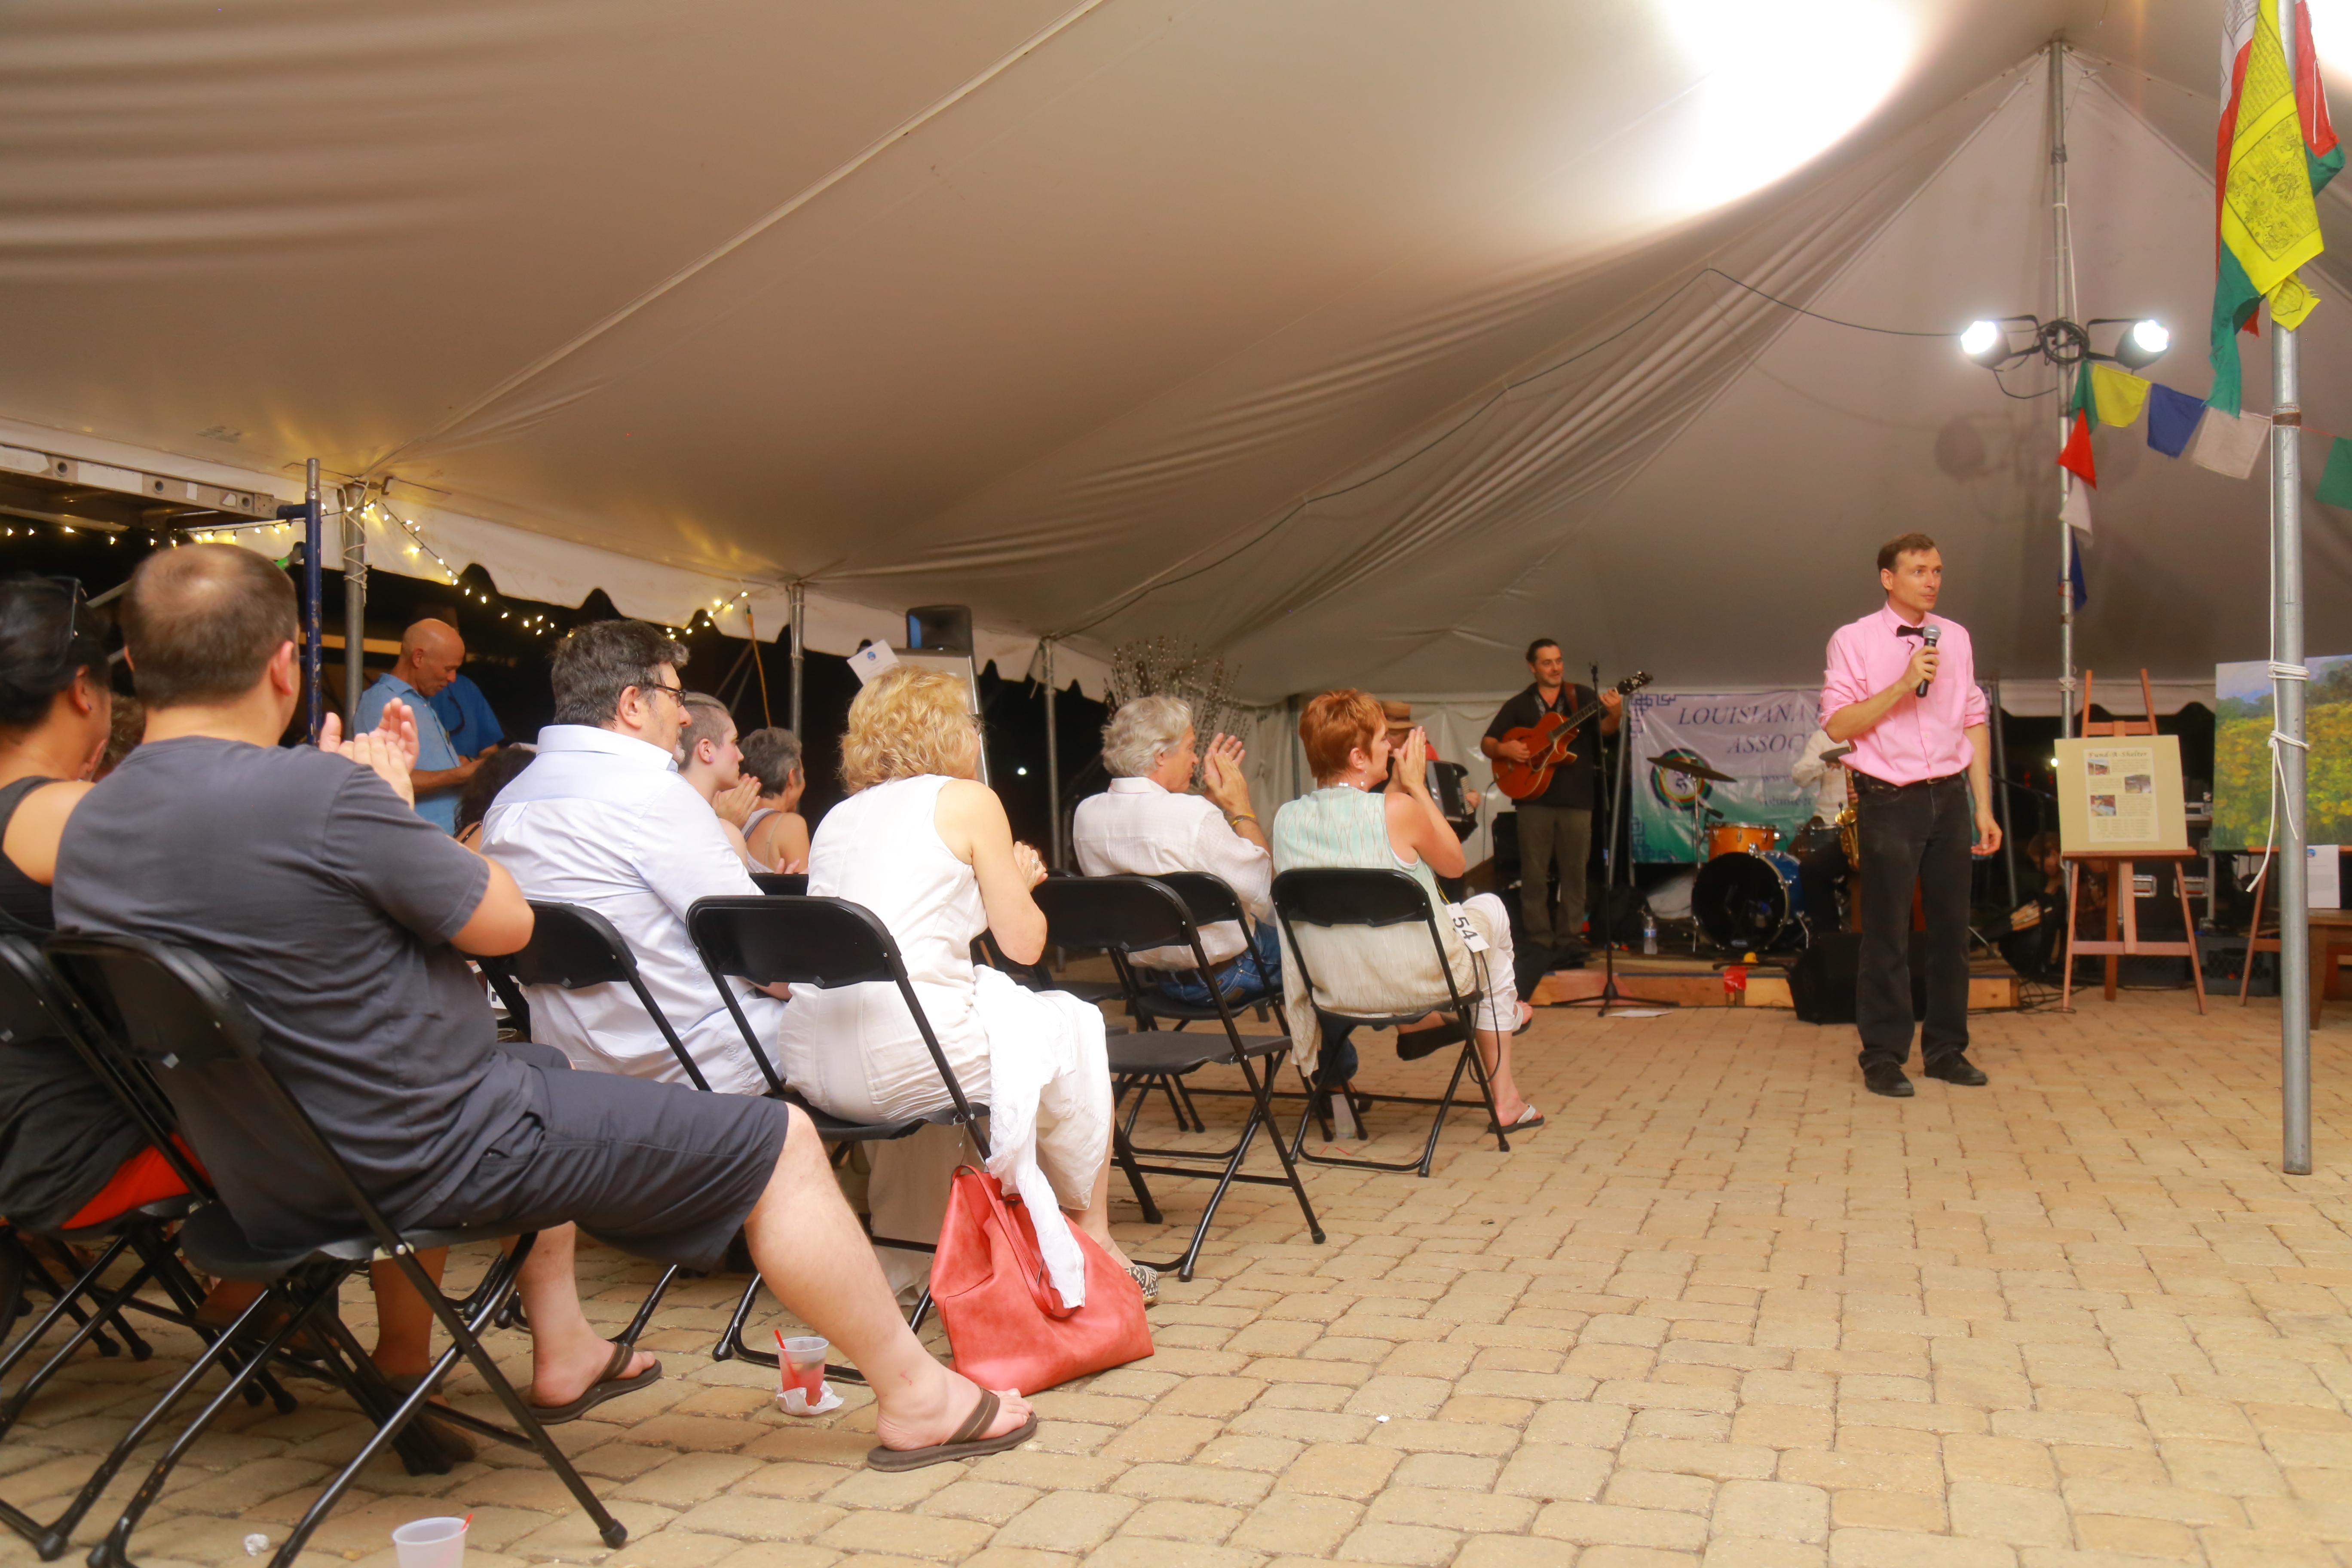 John Calhoun, auctioneer extraordinaire at Full Circle LHA fundraiser